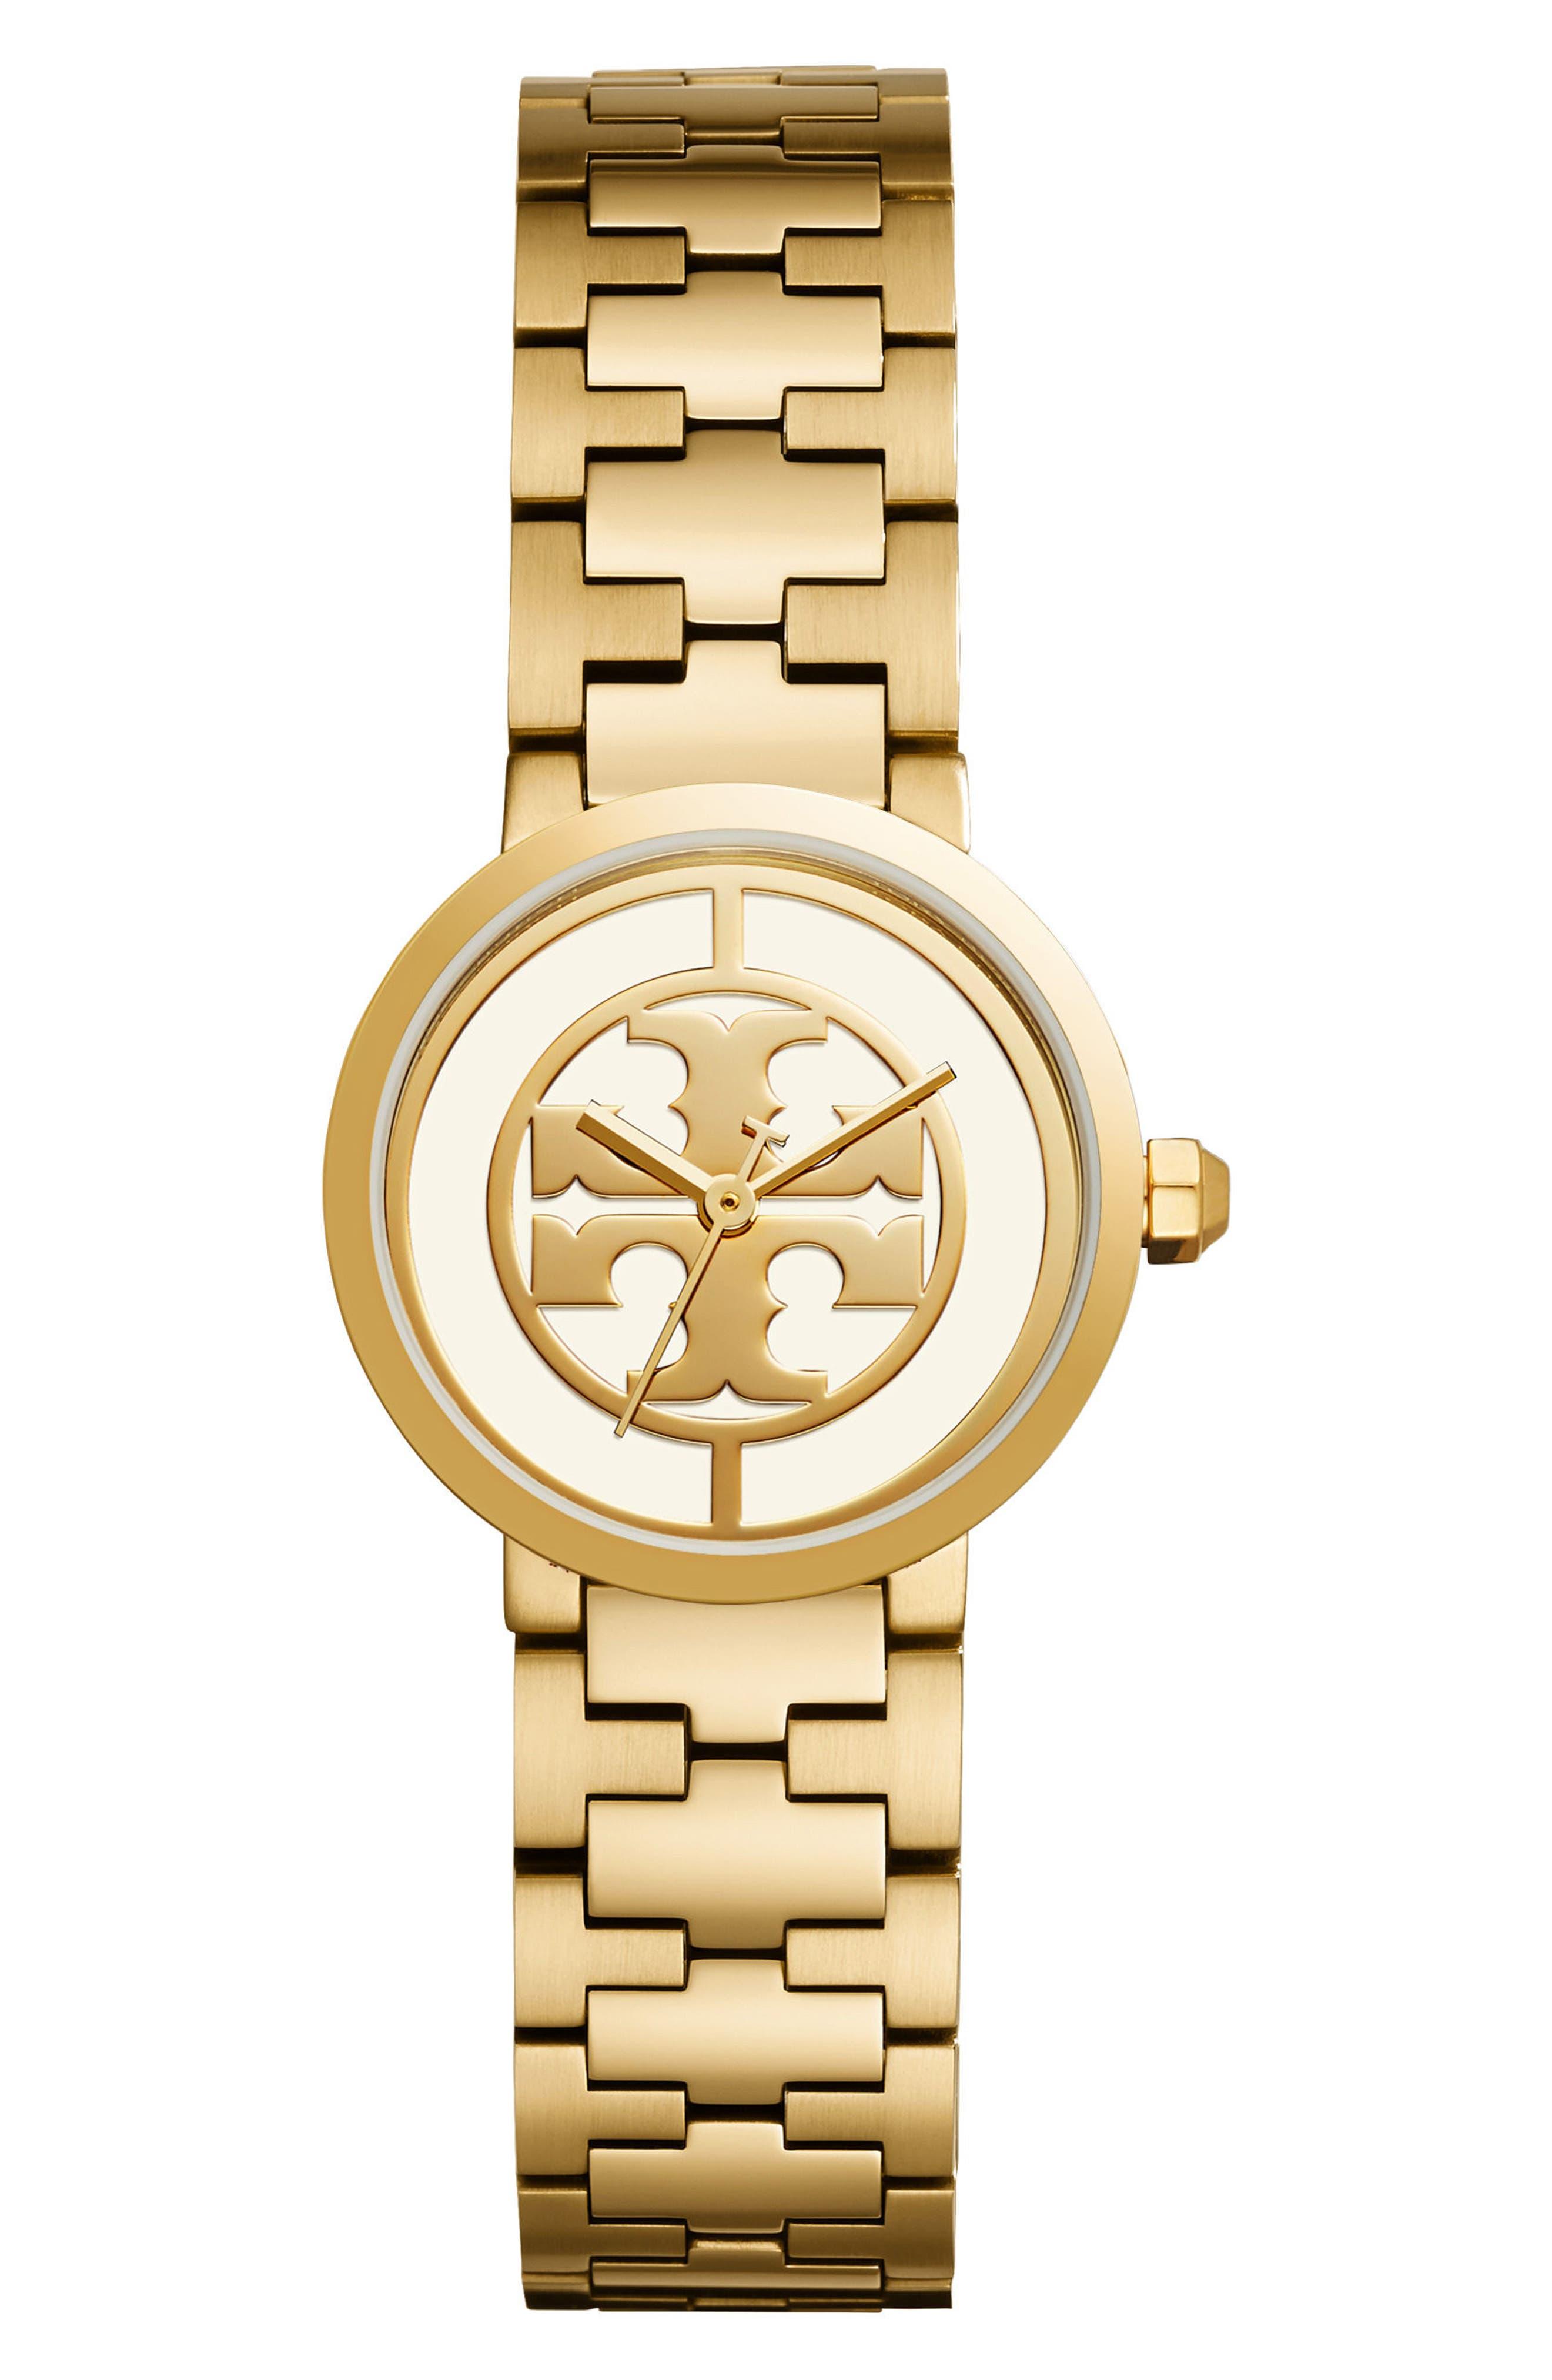 TORY BURCH Reva Logo Dial Bracelet Watch, 28mm, Main, color, GOLD/ IVORY/ GOLD